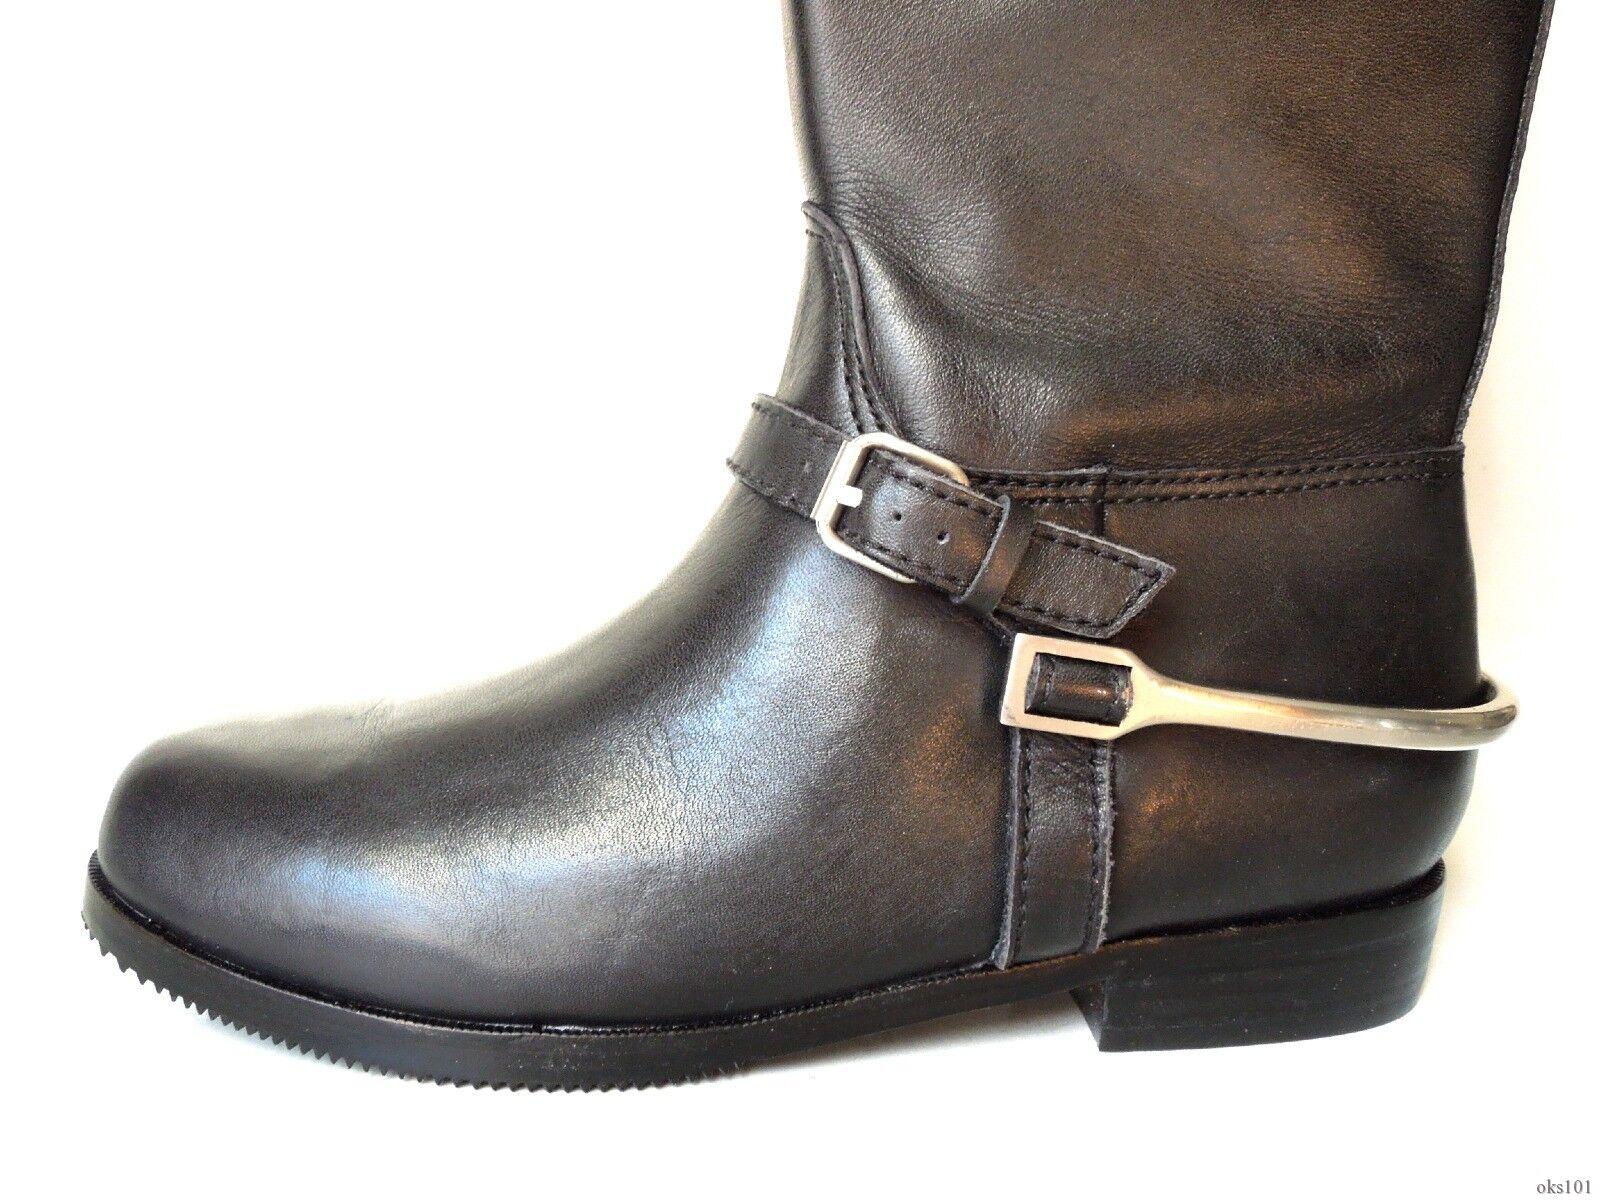 new 425 Pour La Victoire black Equestrian stirrup TALL FLAT riding BOOTS 7.5